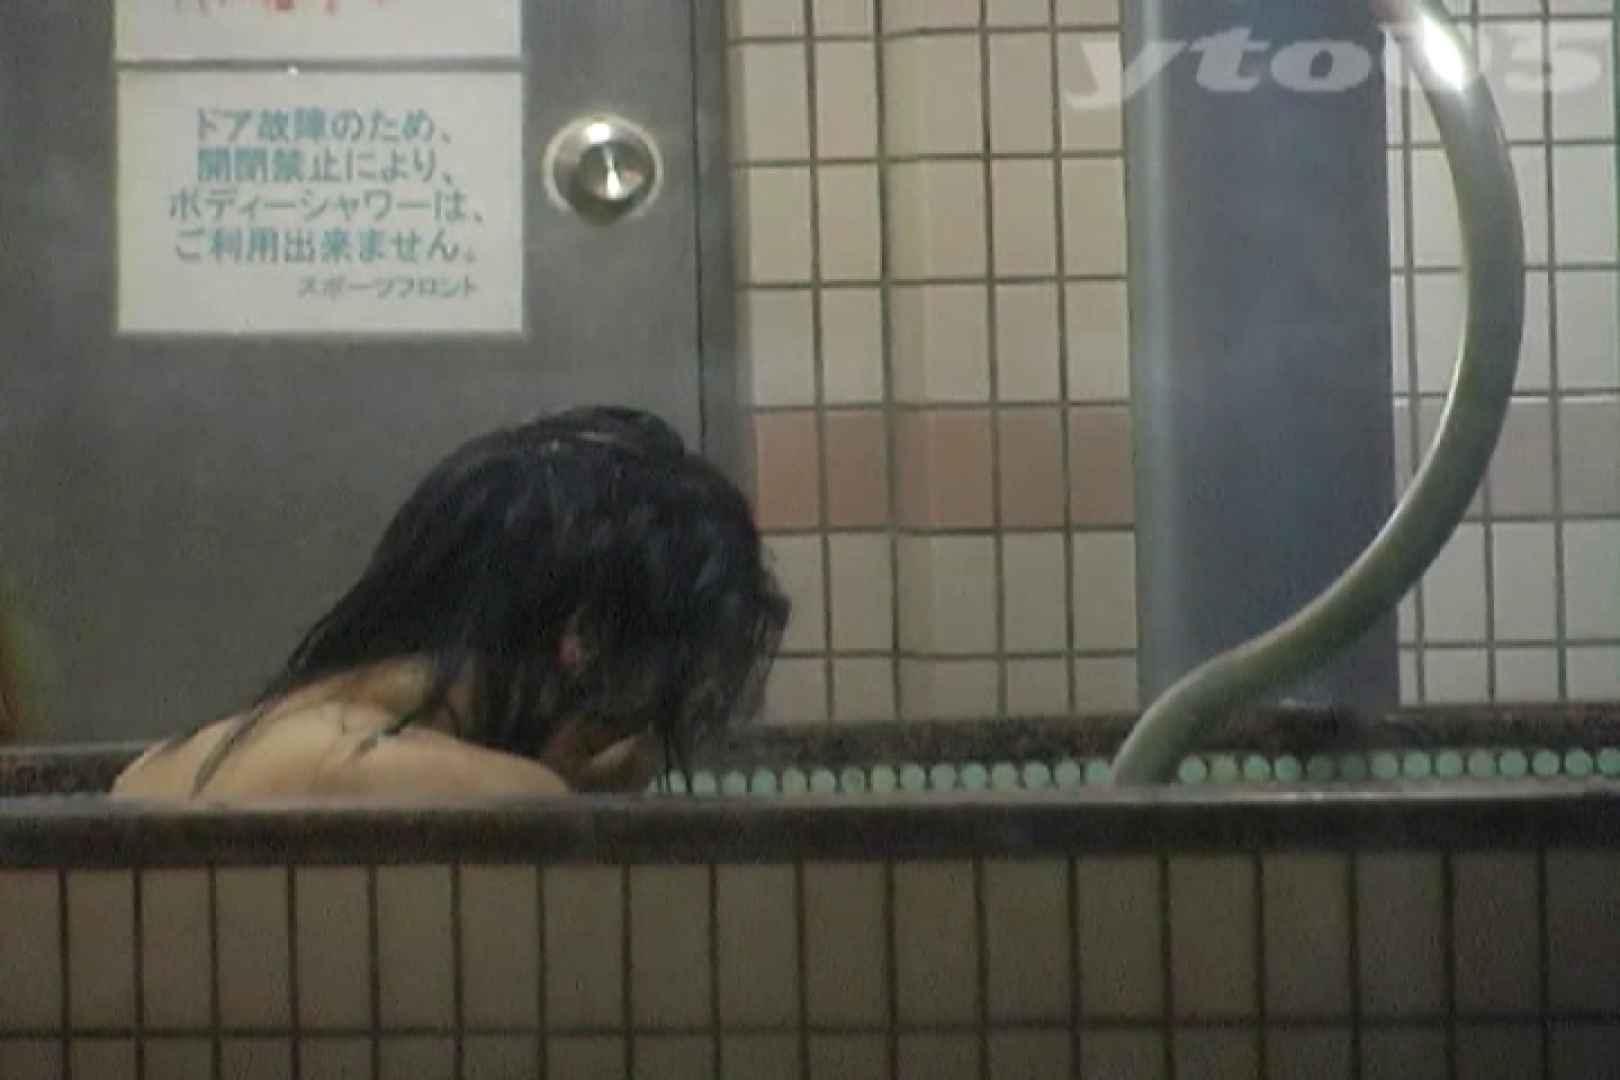 ▲復活限定▲合宿ホテル女風呂盗撮 Vol.31 合宿 濡れ場動画紹介 85pic 17